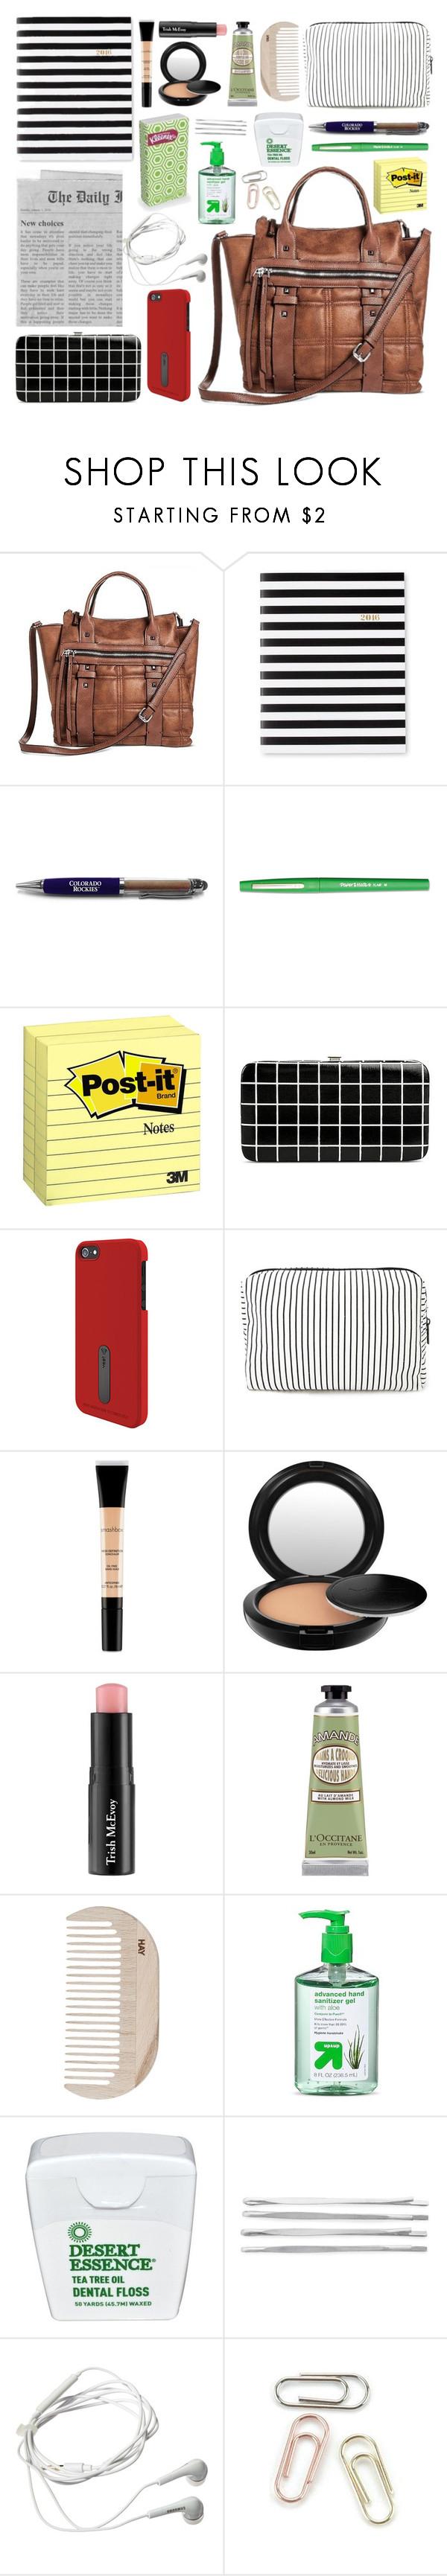 Spencer Hastings inspired bag essentials updated